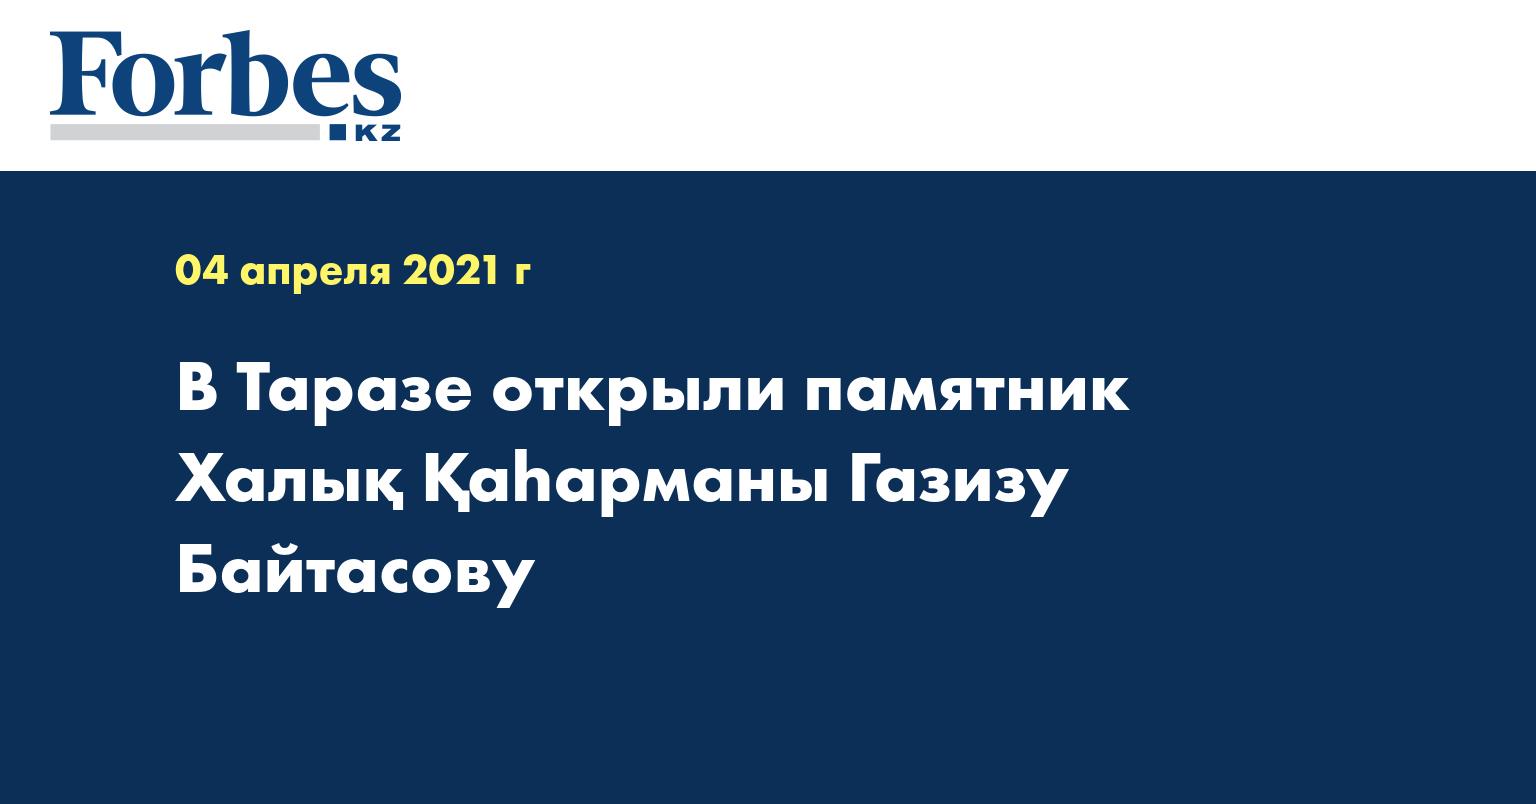 В Таразе открыли памятник Халық Қаһарманы Газизу Байтасову